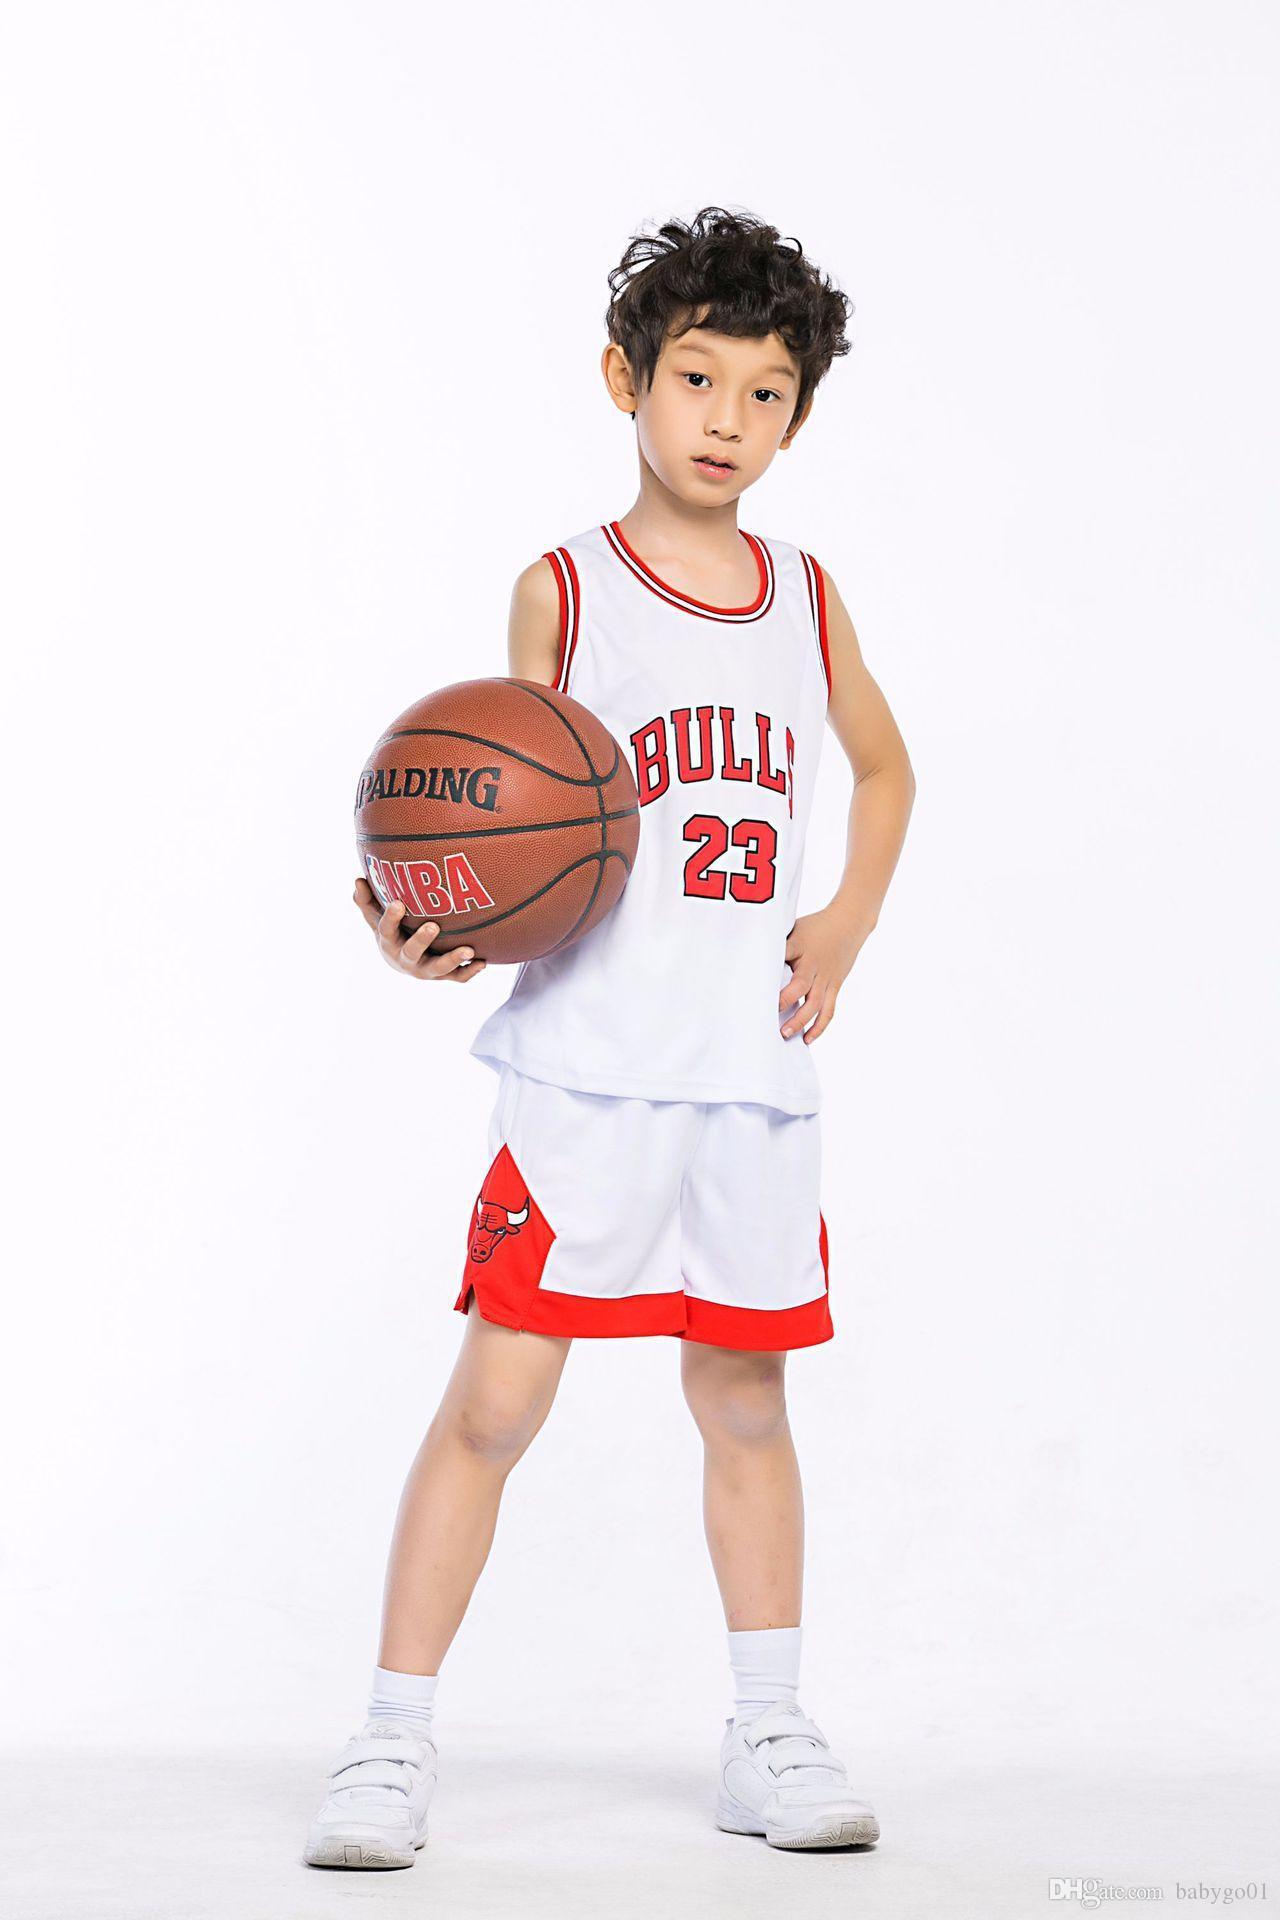 Basketball-Trikot Kinder für Junge Kleinkind Vorschul Basketball Jersey T-Shirt et Shorts Jugend kleiner billige kundenspezifische